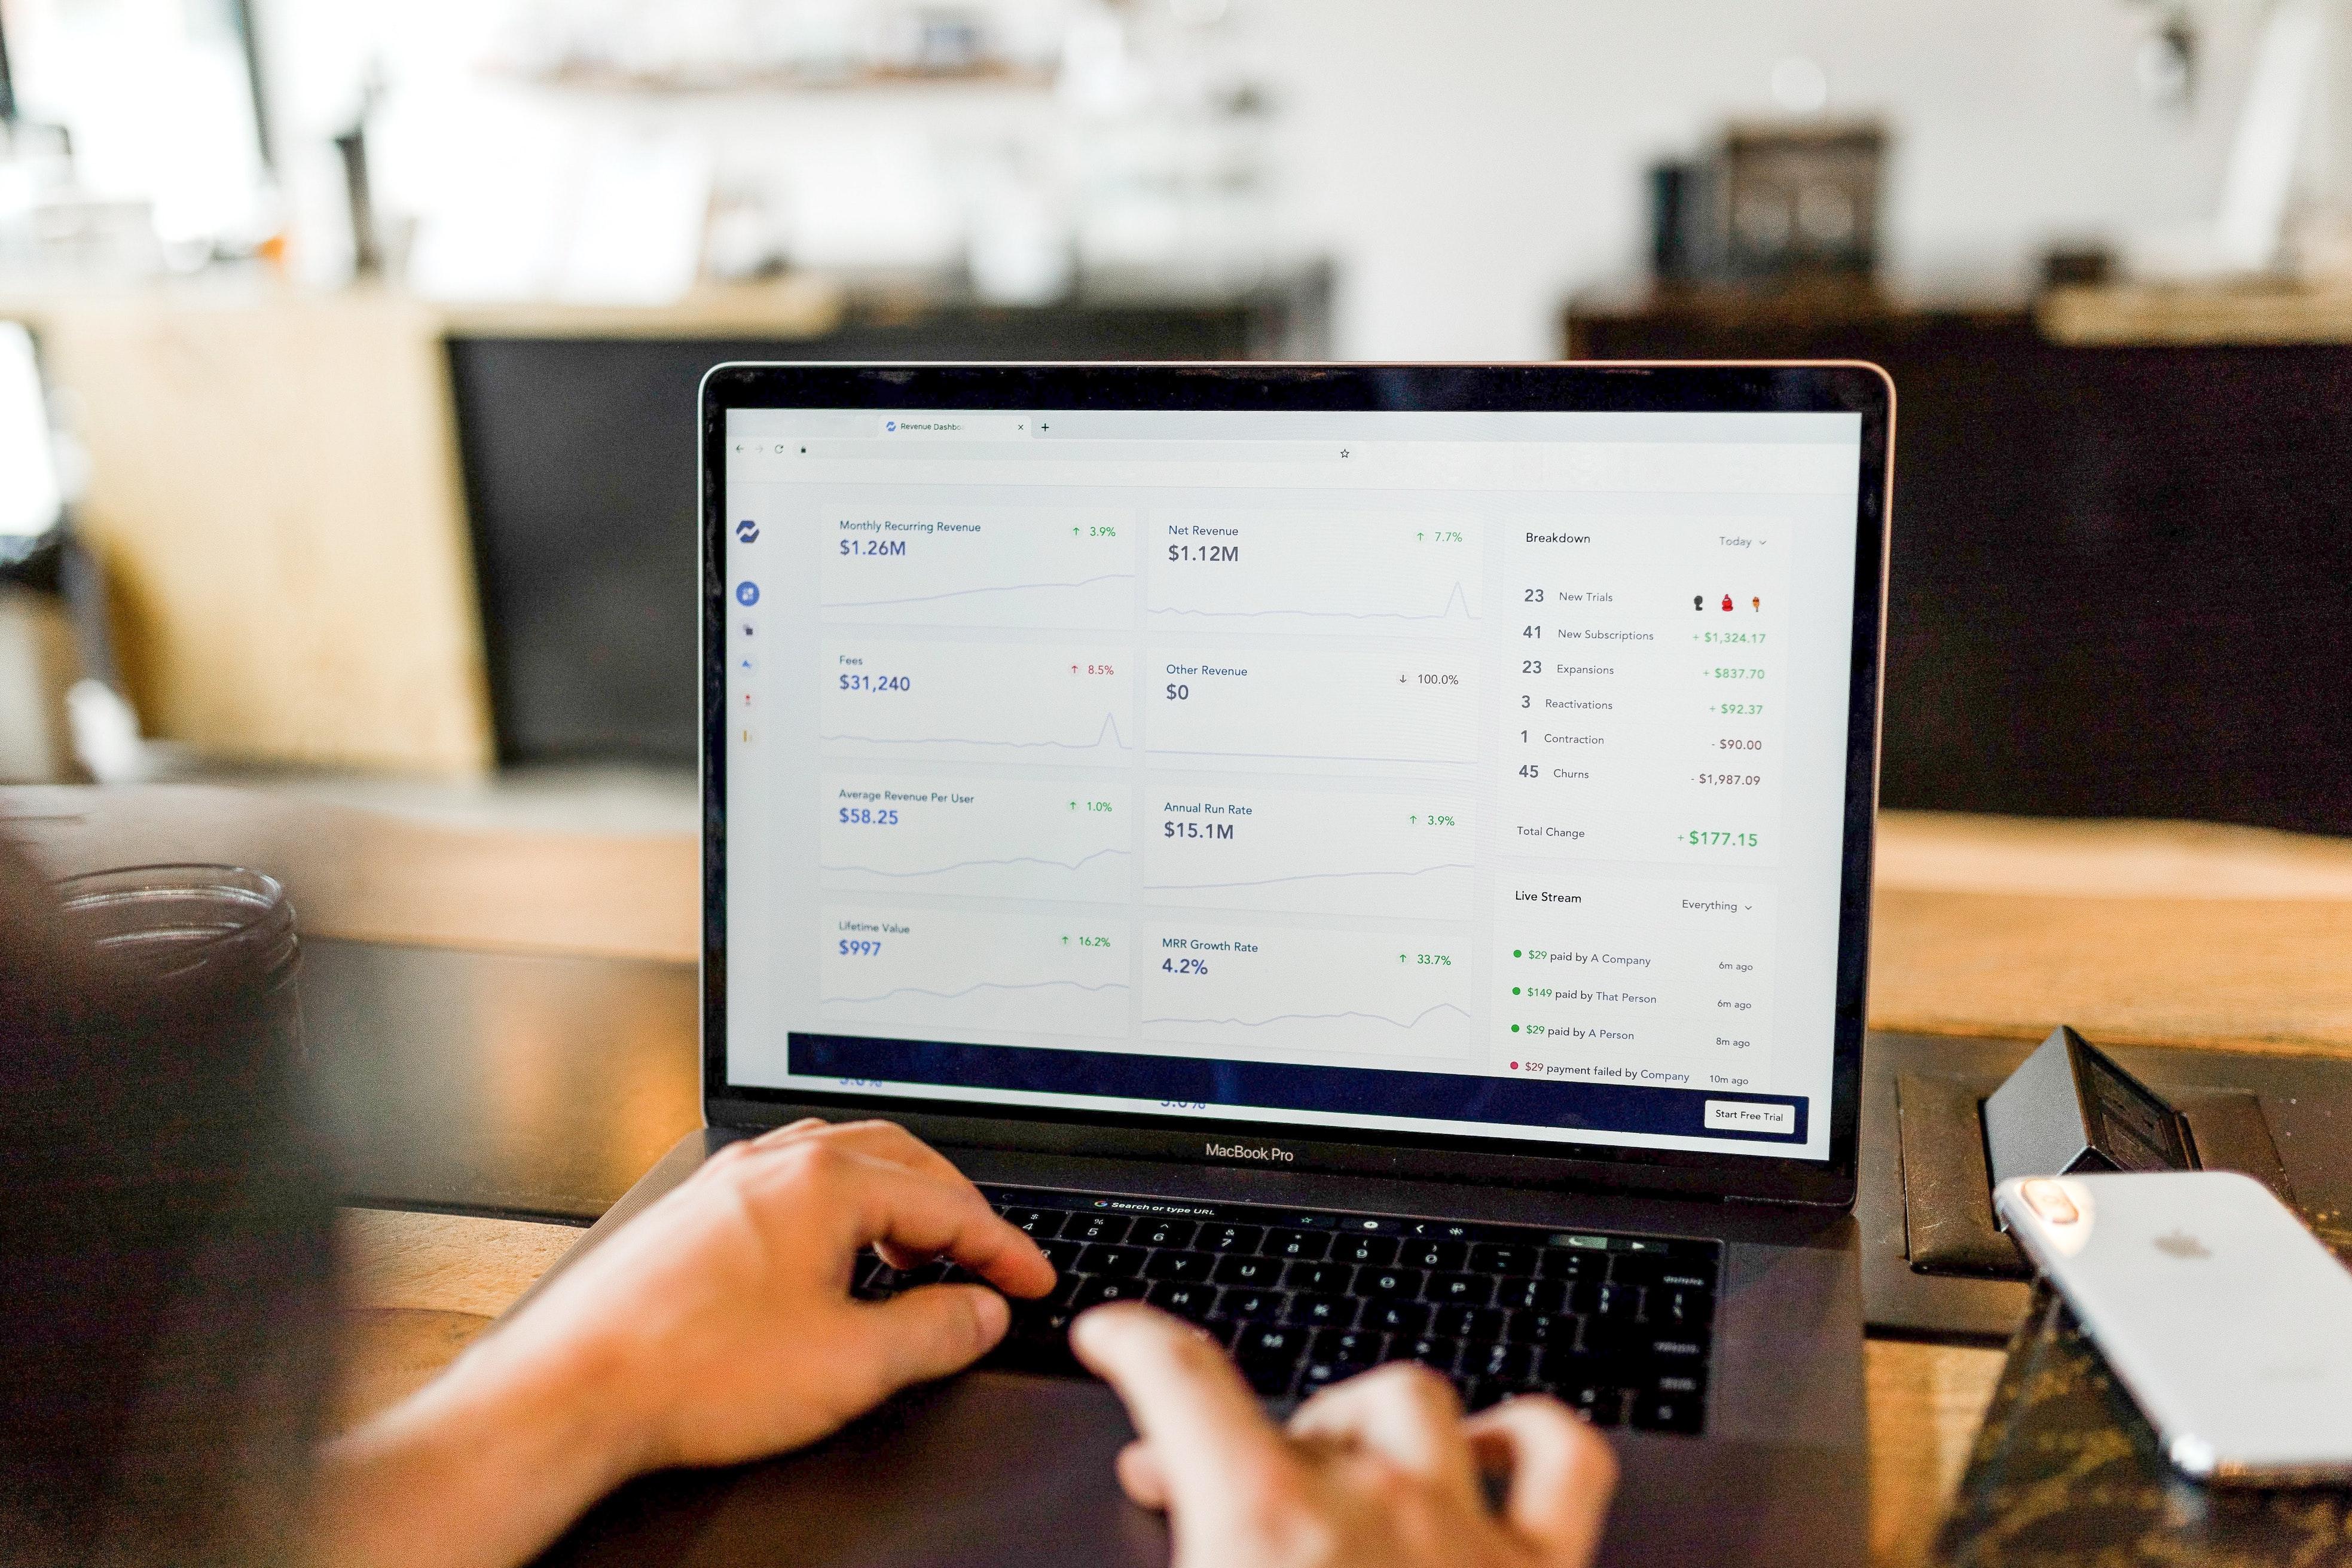 Human resource information system on laptop